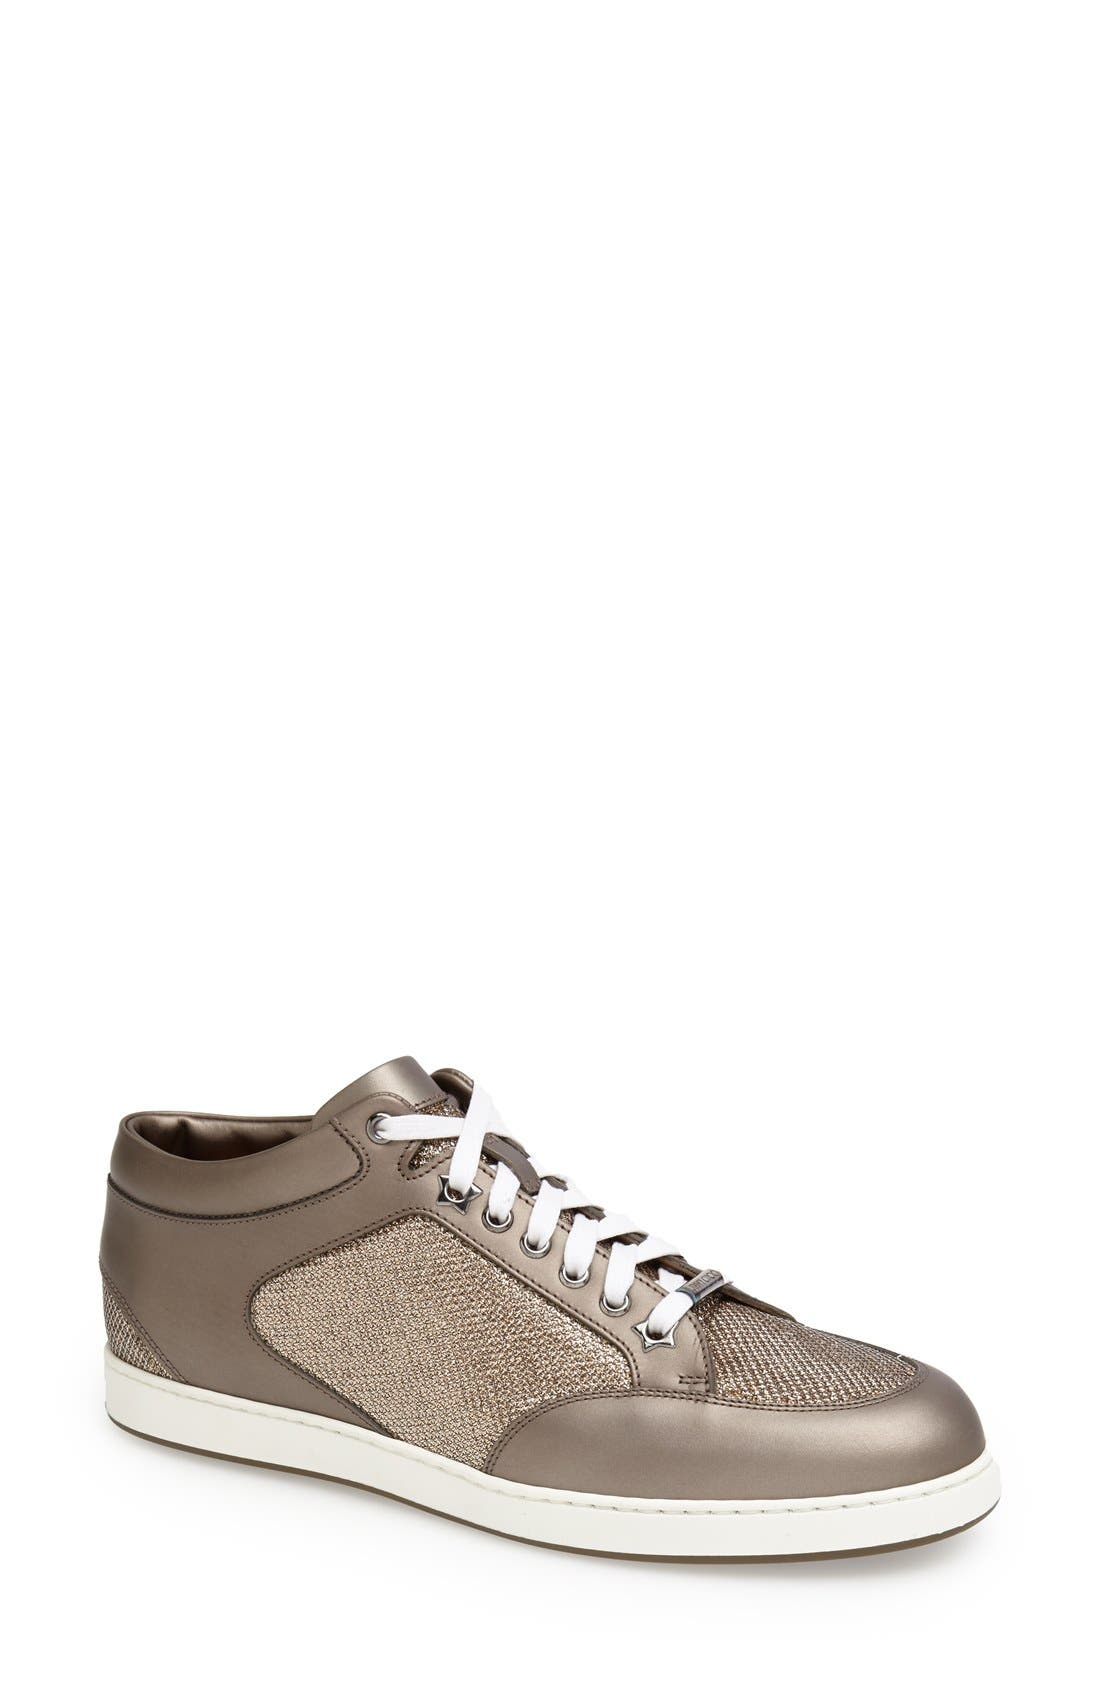 Alternate Image 1 Selected - Jimmy Choo 'Miami' Sneaker (Women)